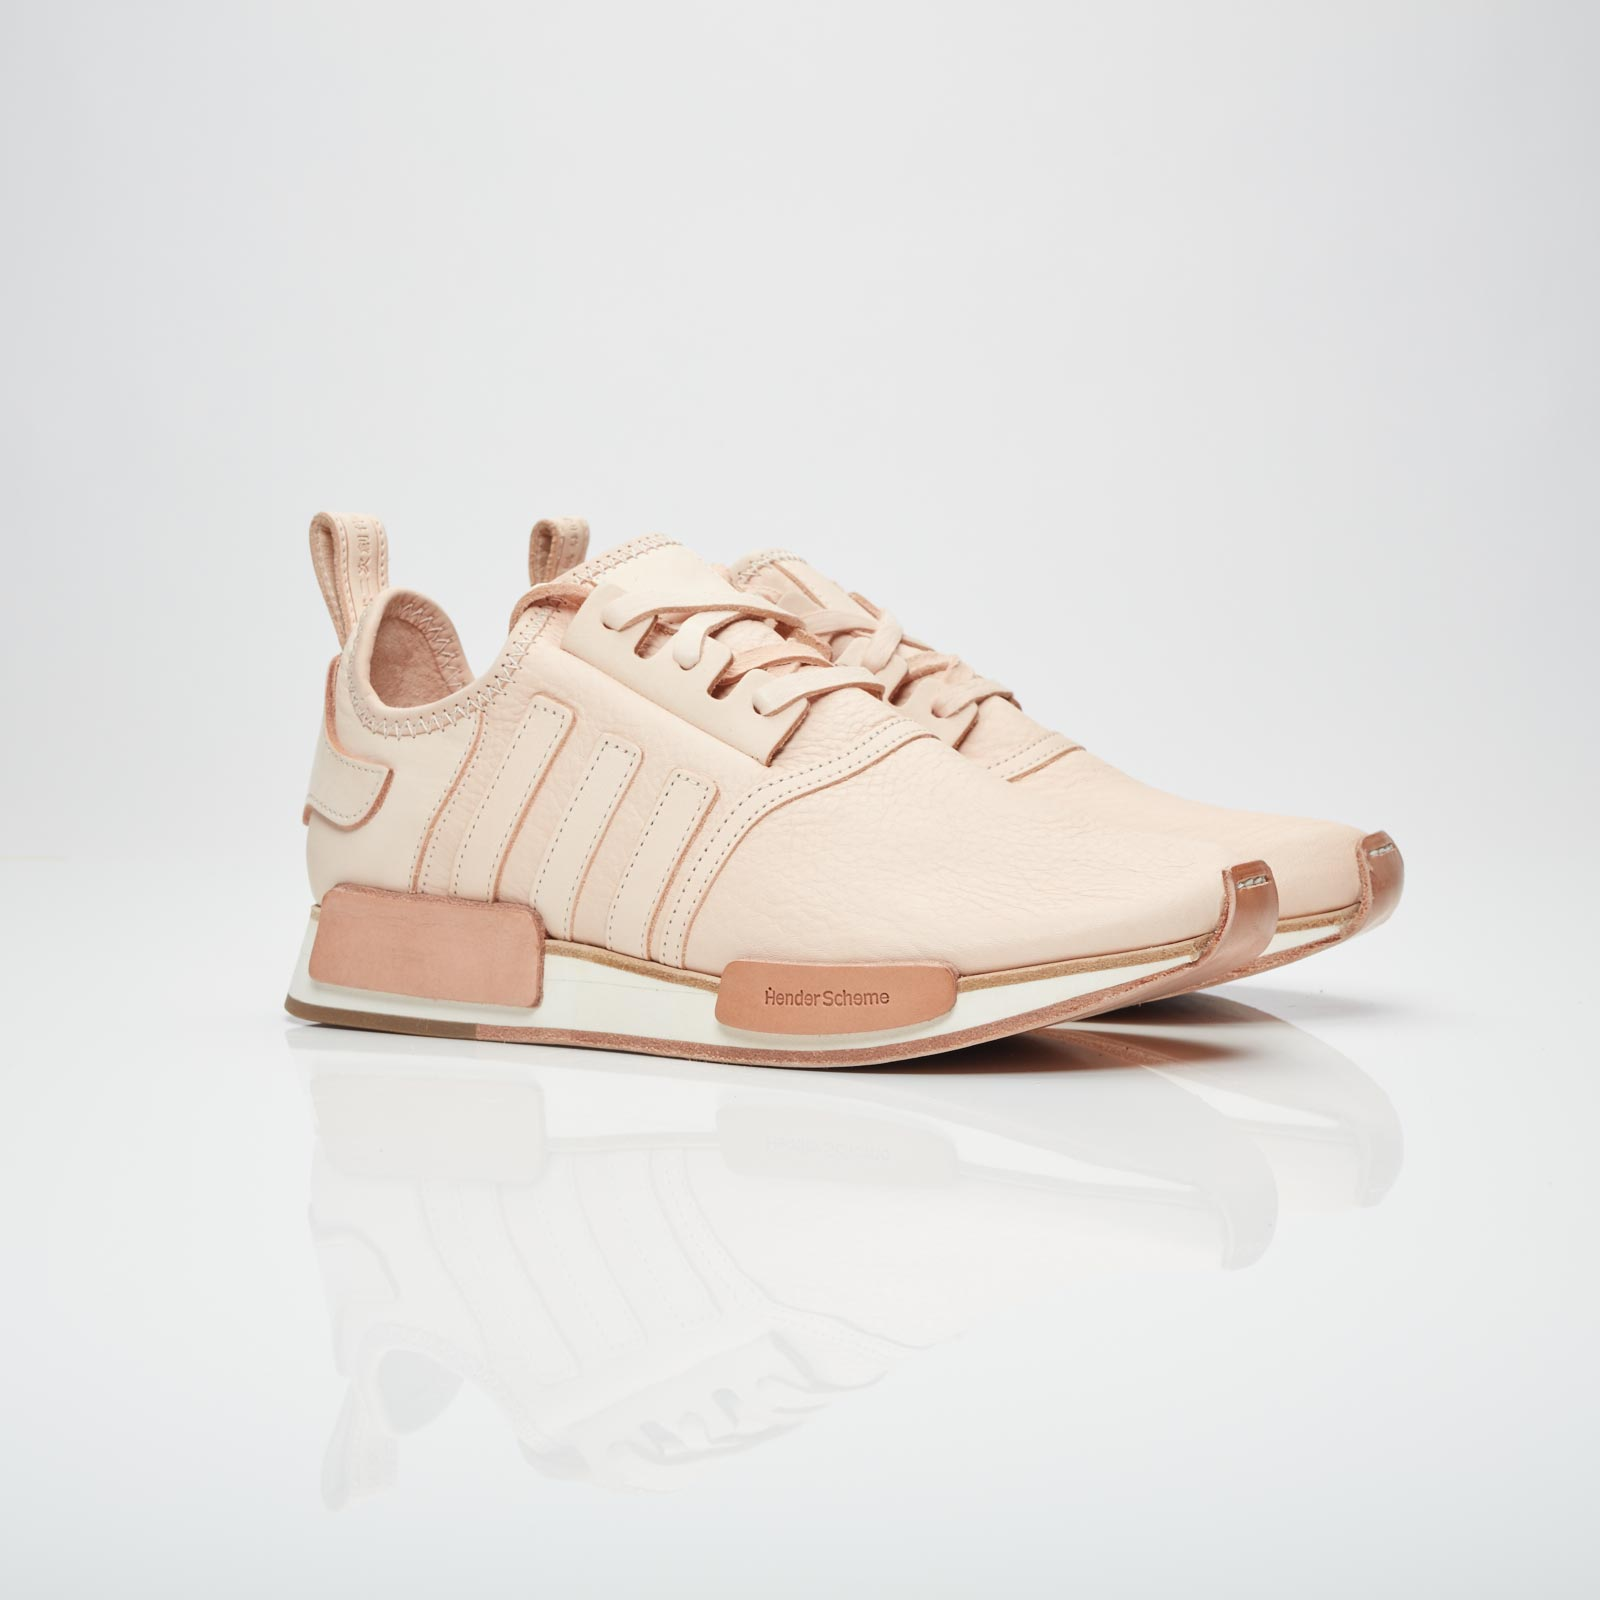 54eb023c35d64 adidas NMD R1 Hender Scheme - Ci9814 - Sneakersnstuff